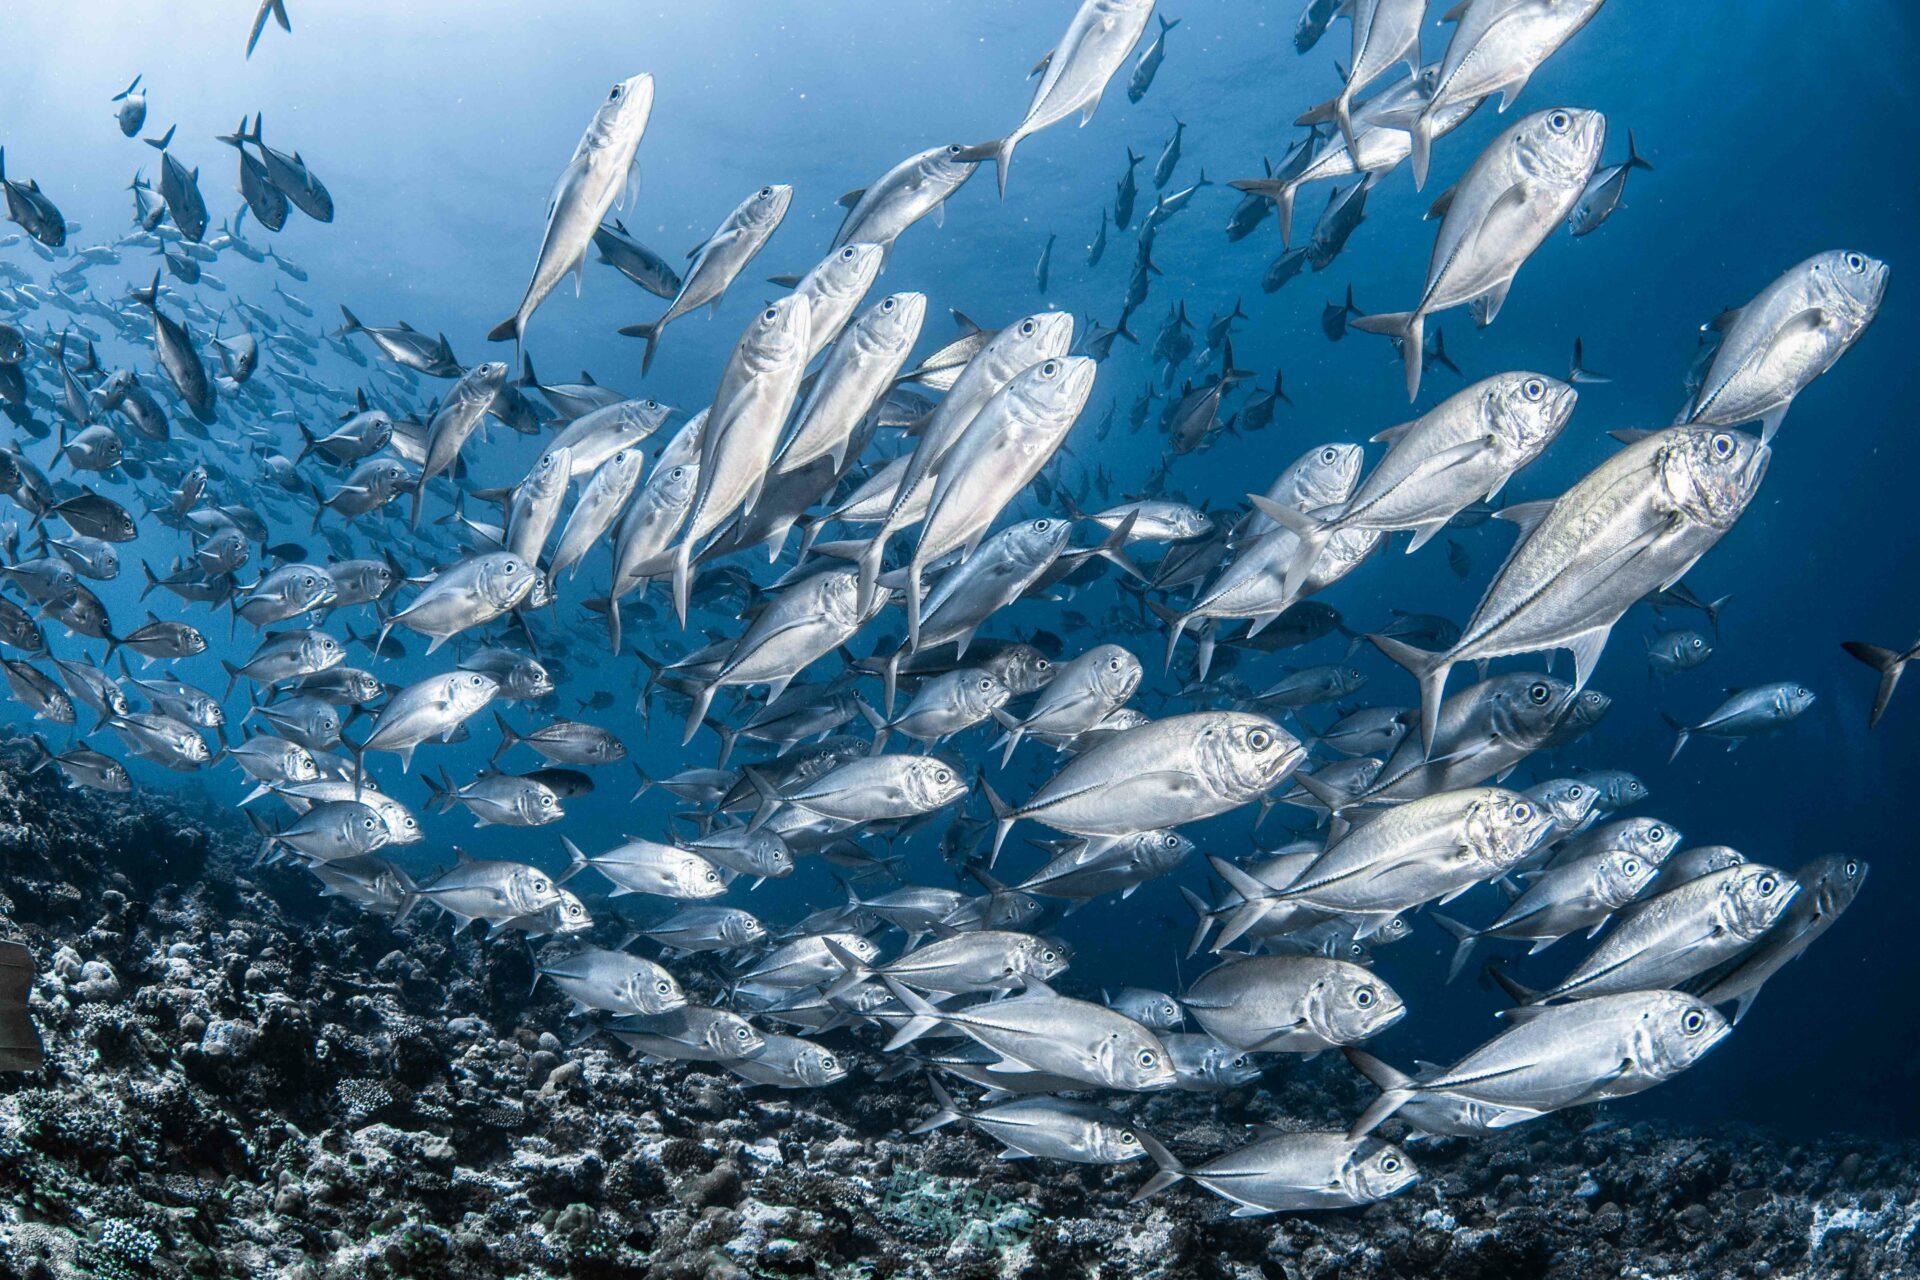 Fish School - Fish Free February